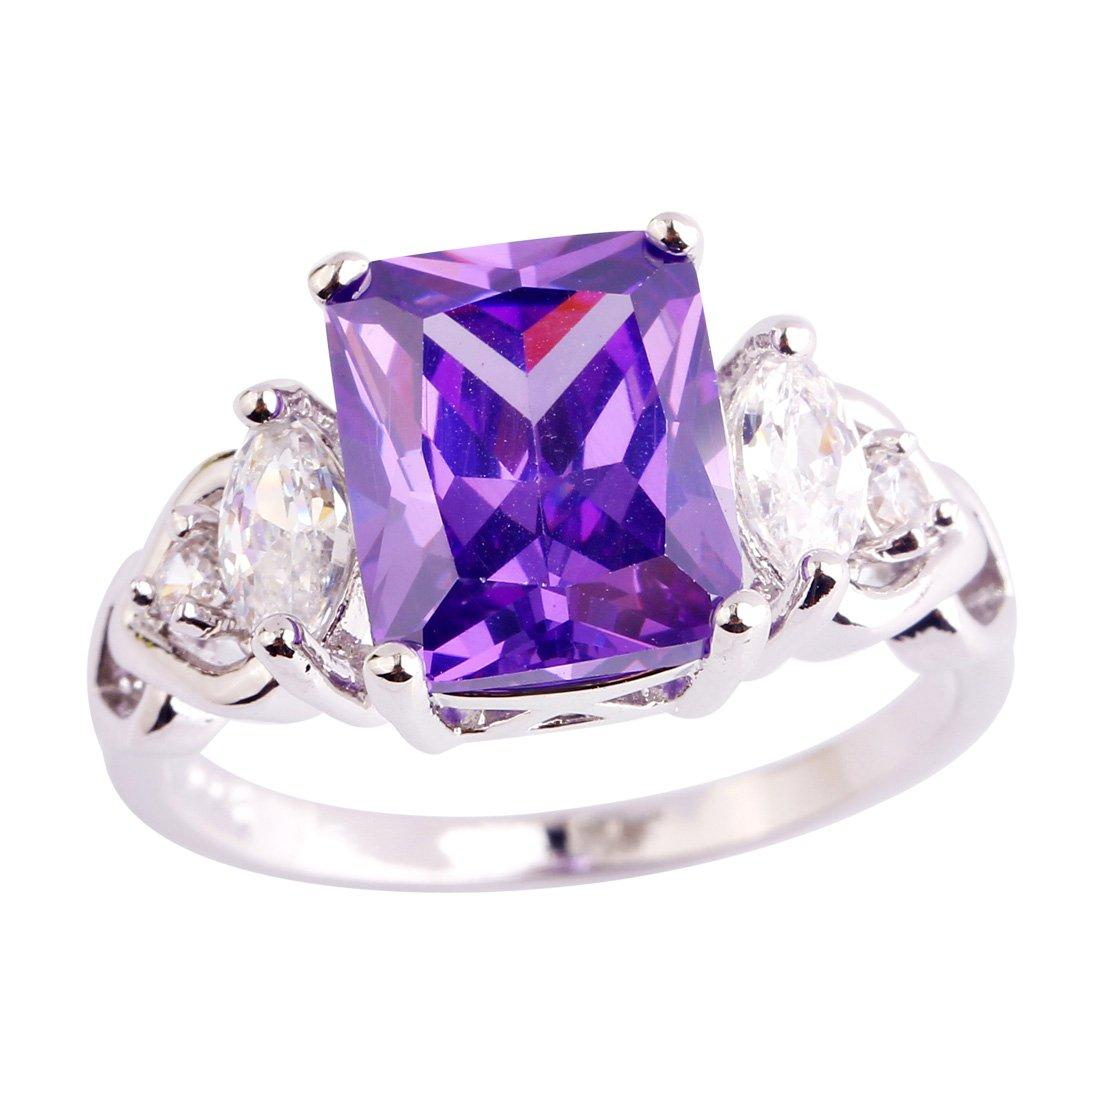 PSEZY Mystic Rainbow Topaz Amethyst rings for Women Vintage Engagement Rings Promise Rings MAE498-B498 9.0